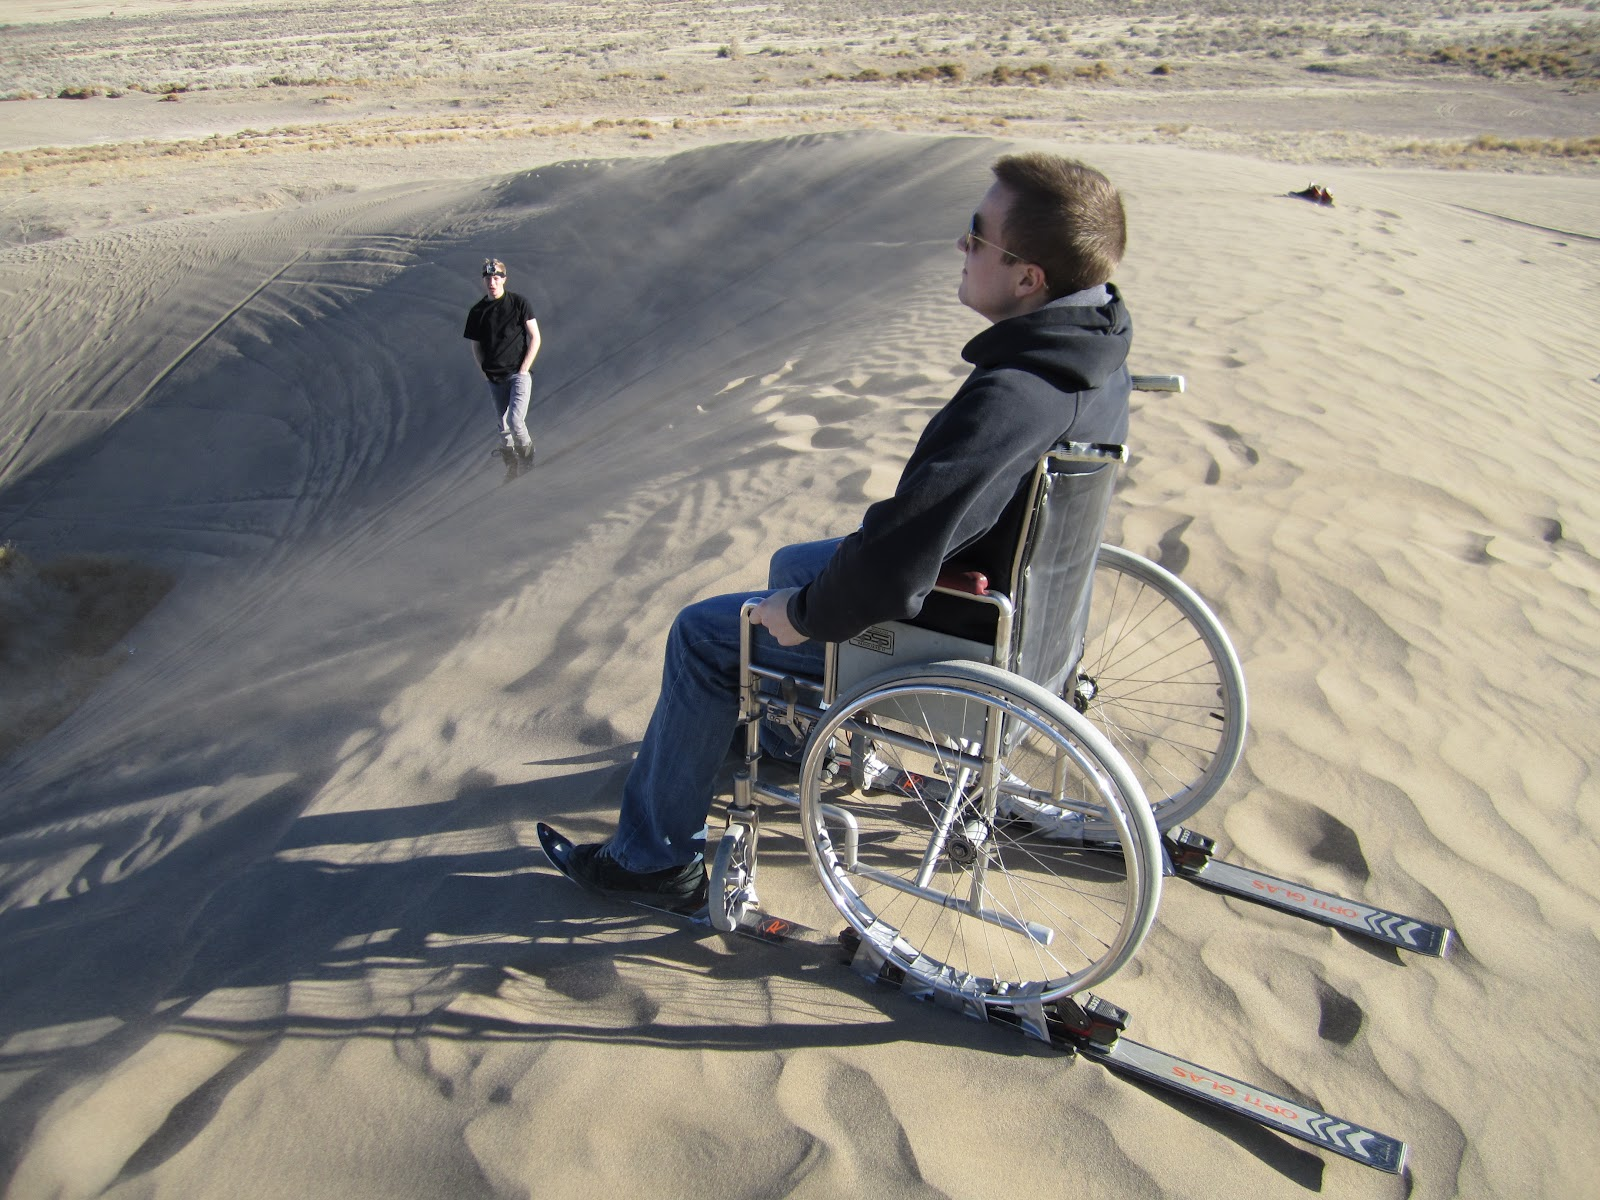 wheelchair skiing leather sleeper chair canyon 39s adventure craze sandboarding the oak city sand dunes